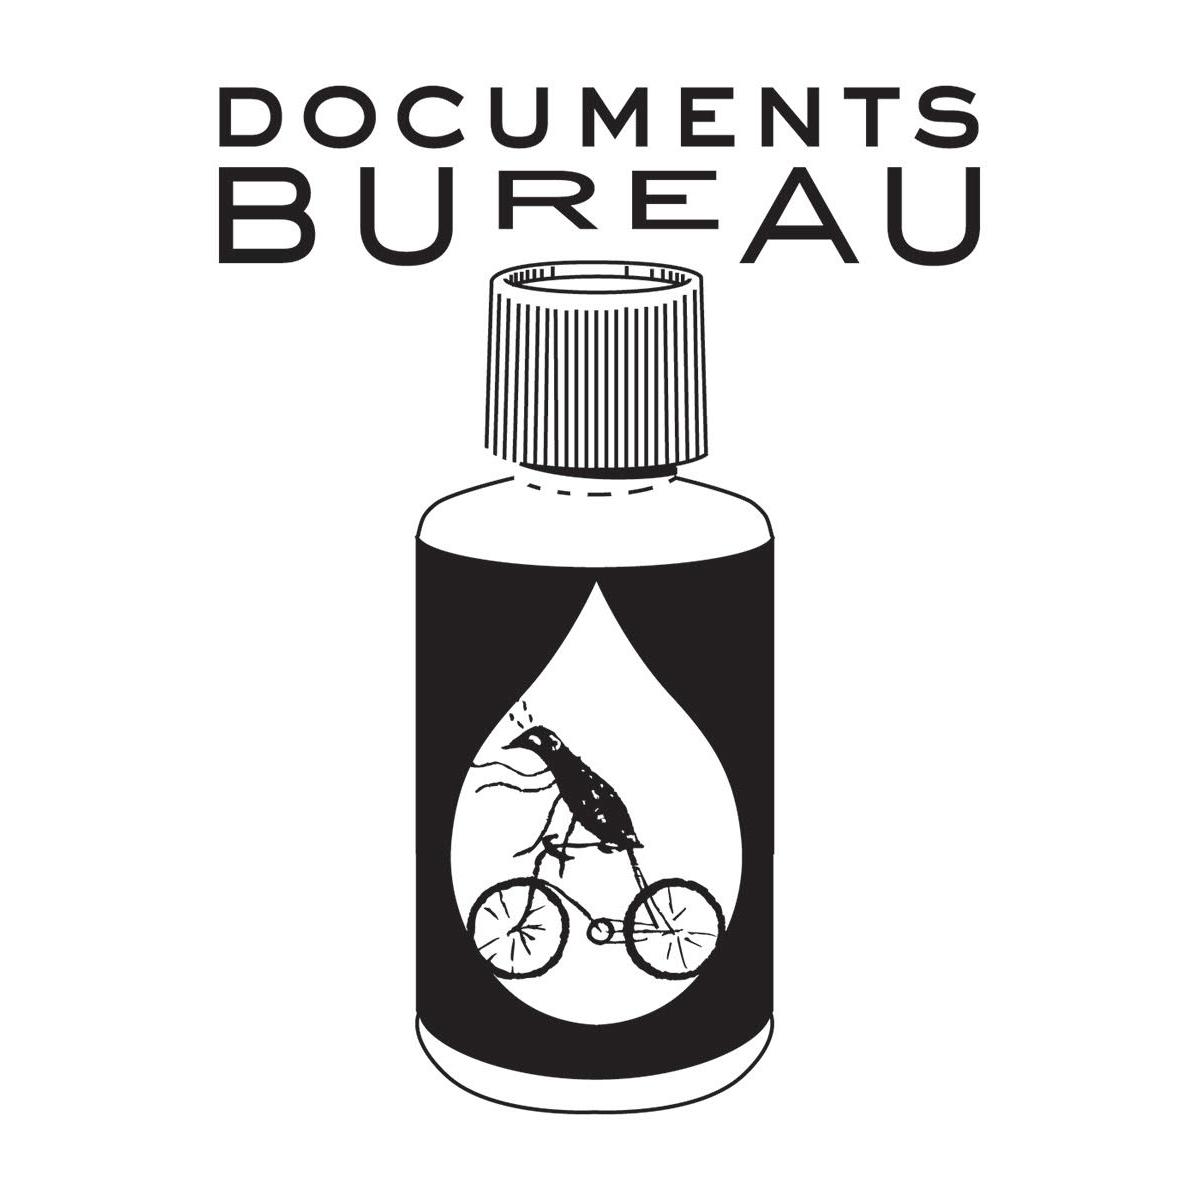 Documents-Bureau.jpg